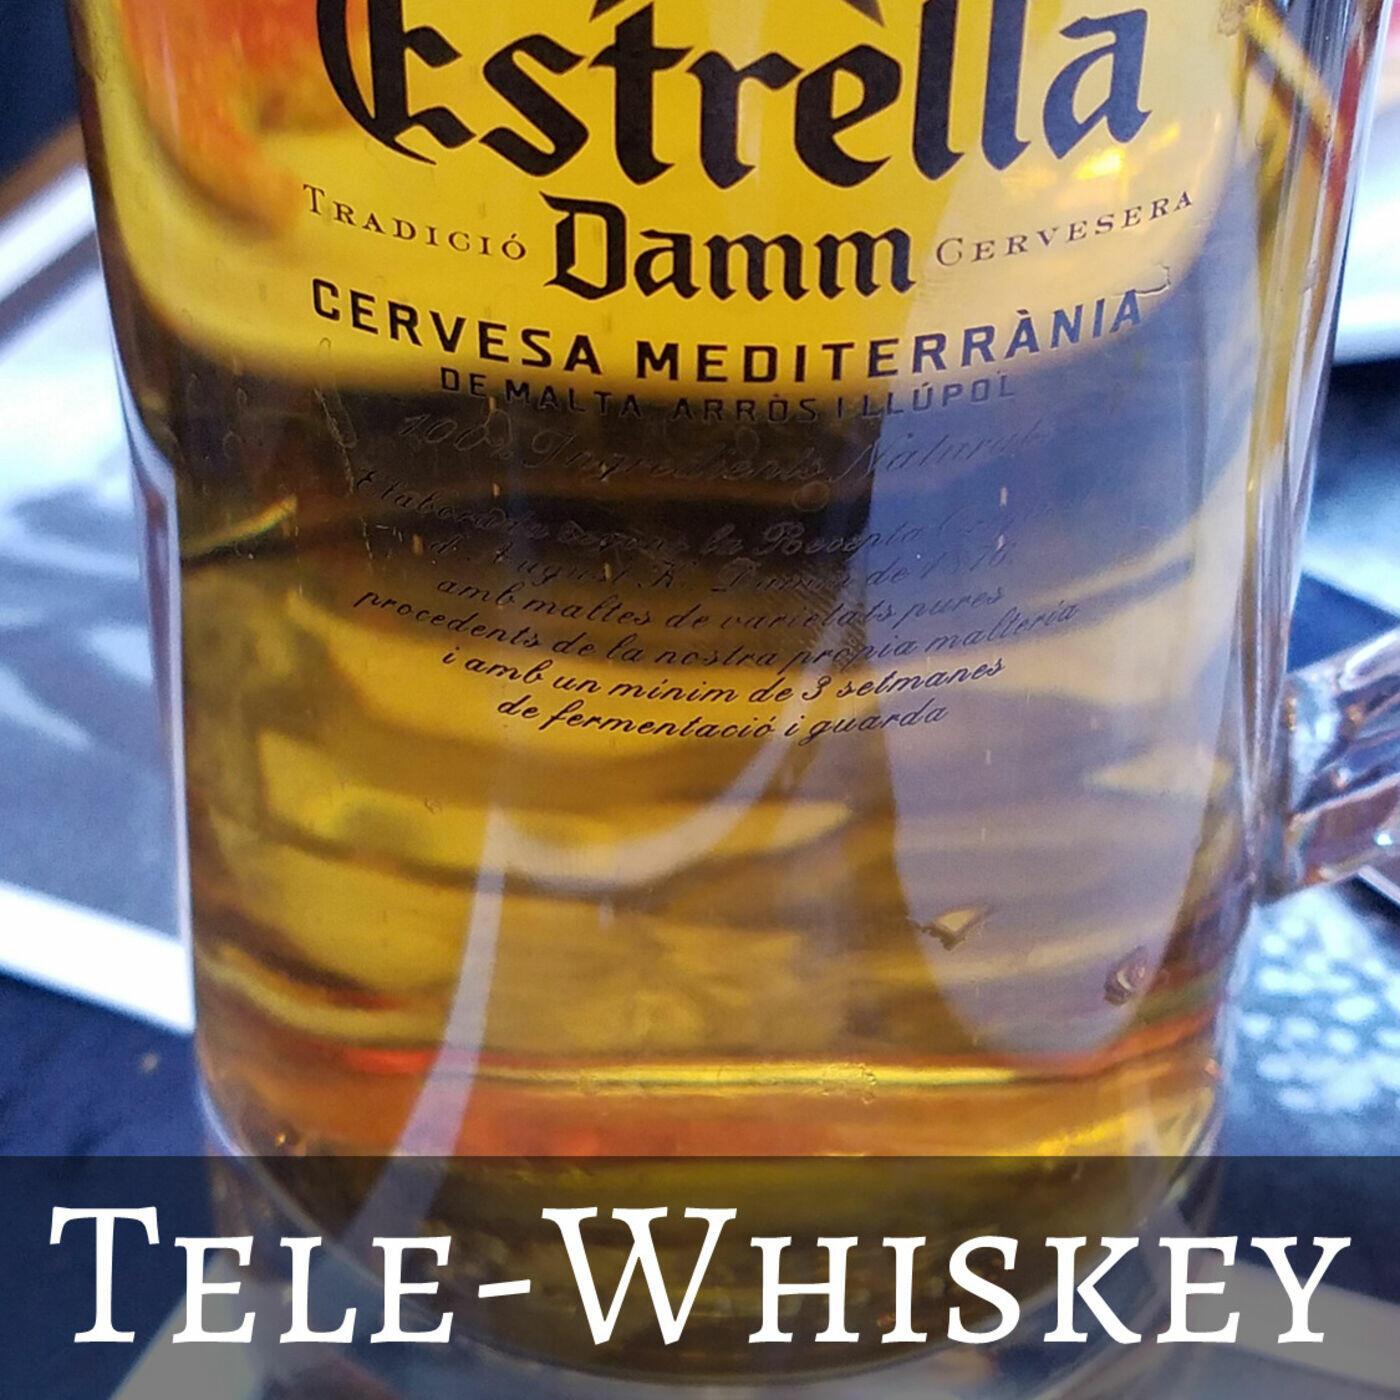 Tele-Whiskey: Digital Conversations that Provoke